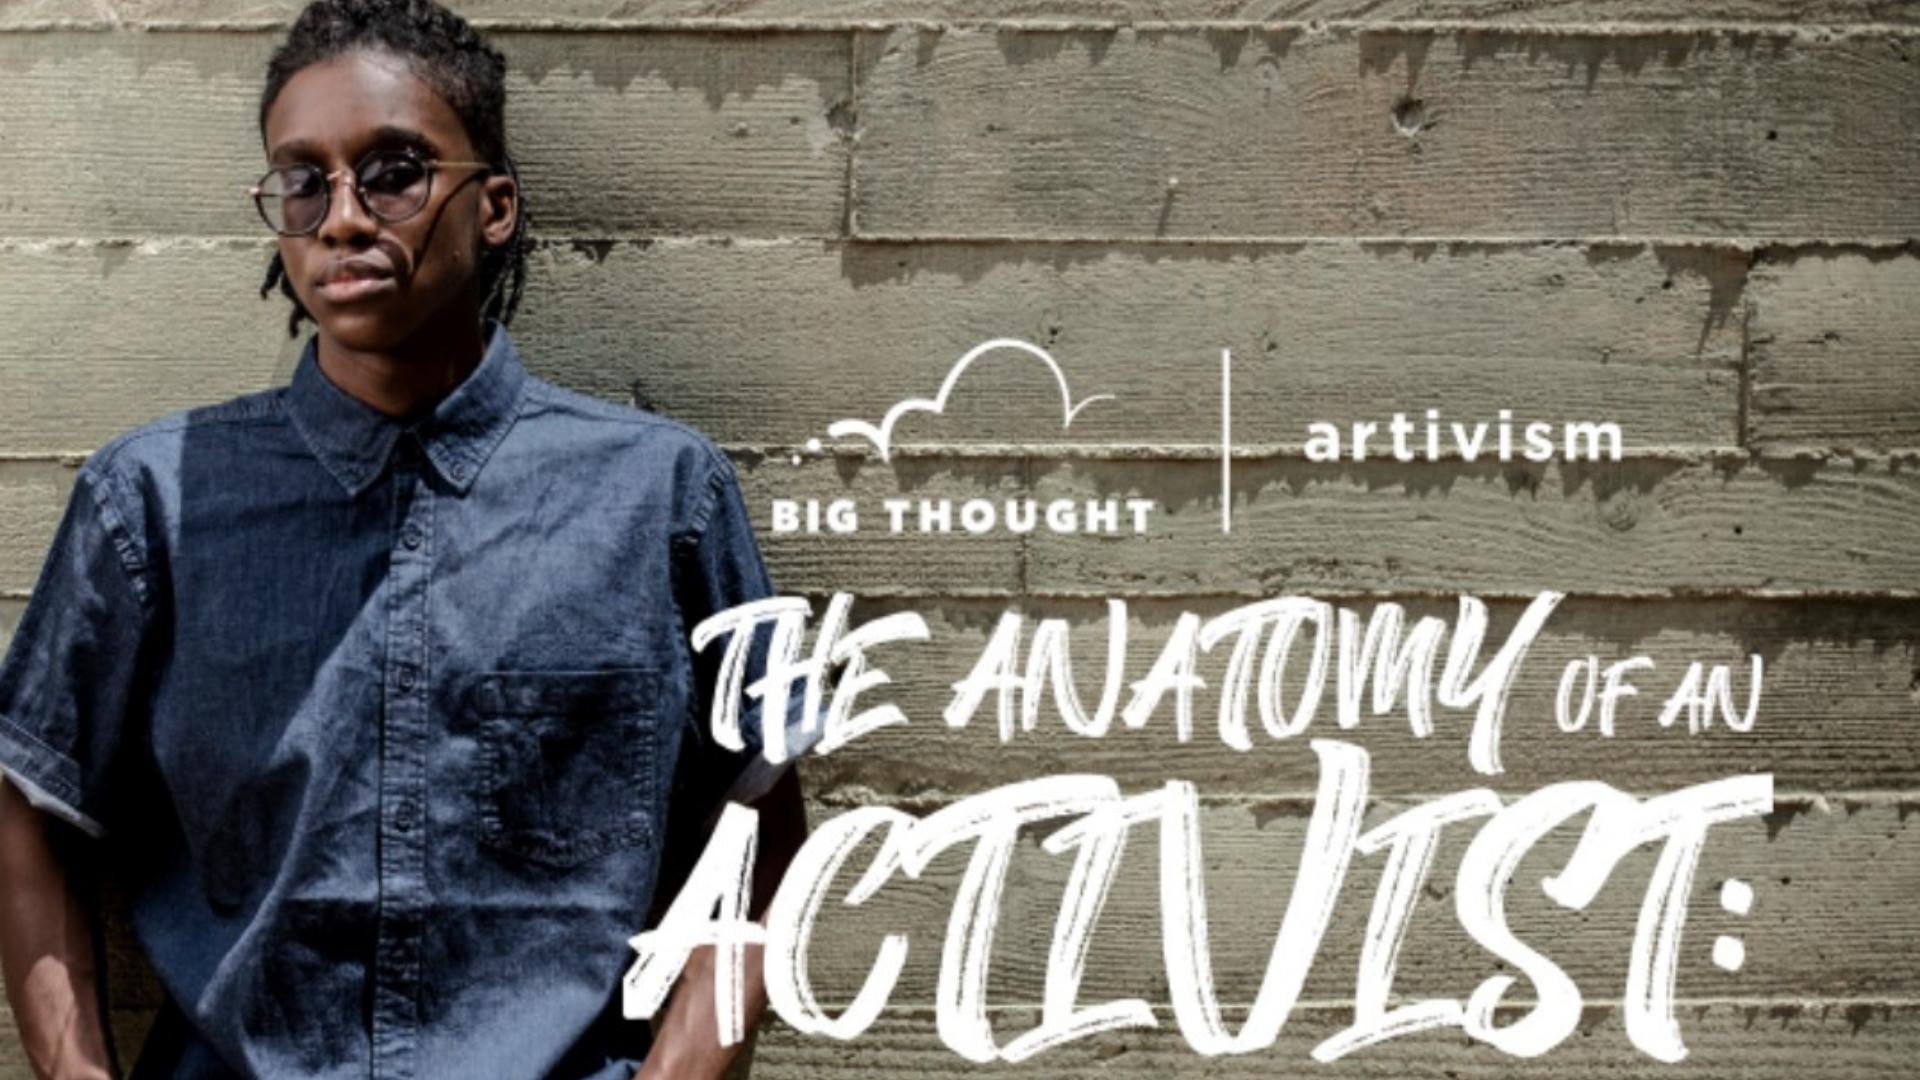 Artivism: Anatomy of an Activist